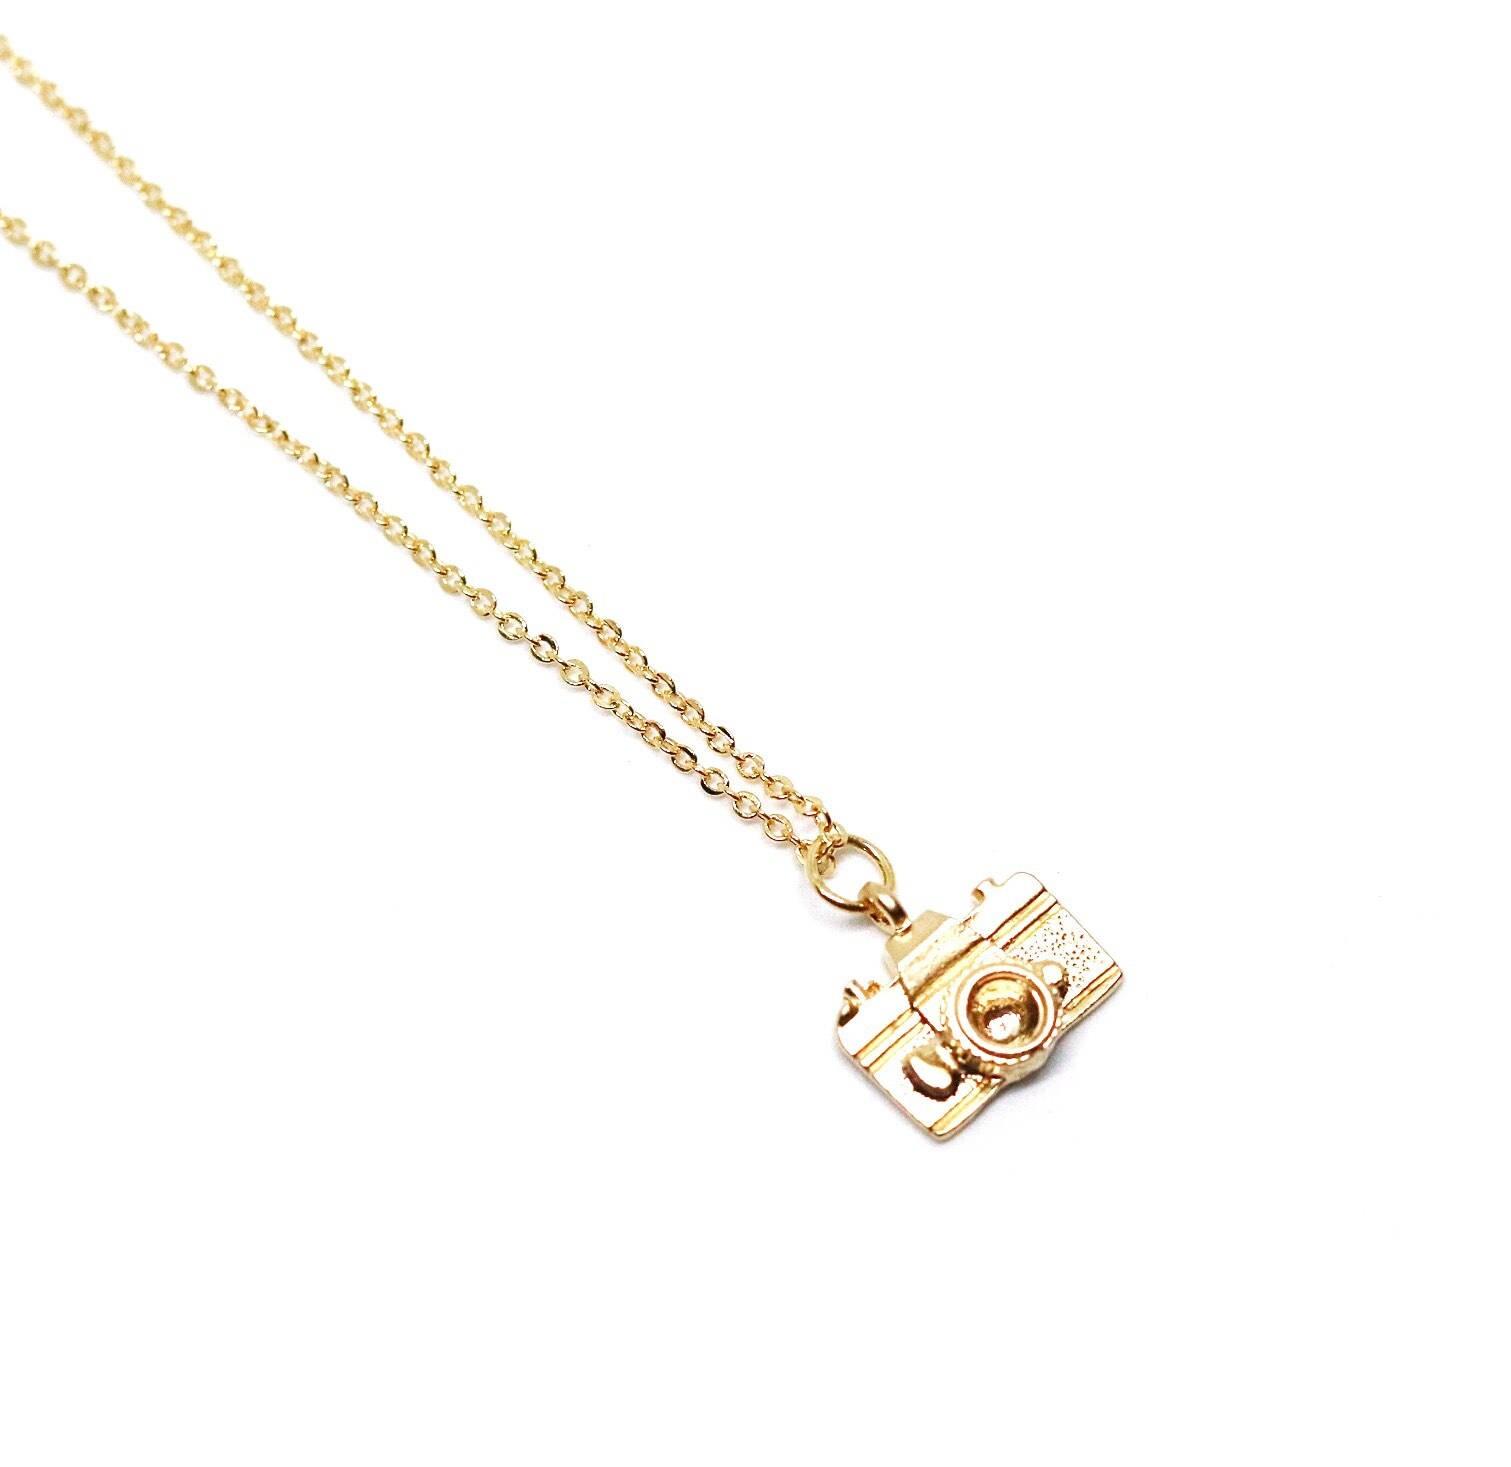 Gold camera tree necklace camera pendant camera necklace gold gold camera tree necklace camera pendant camera necklace gold chain gold delicate necklace aloadofball Gallery